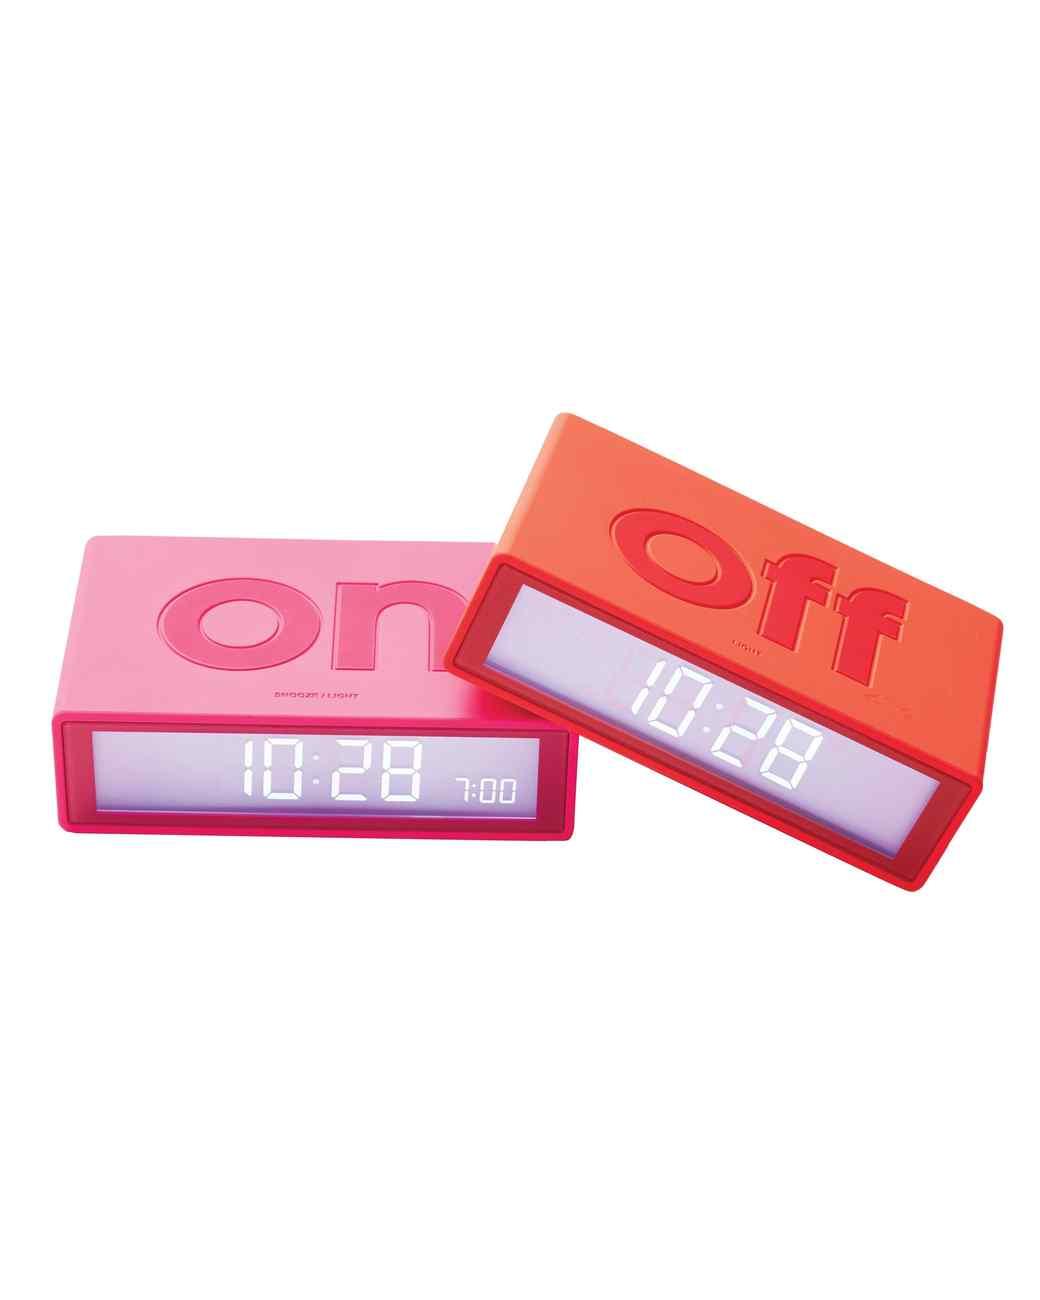 clocks-002-d112732-0216.jpg